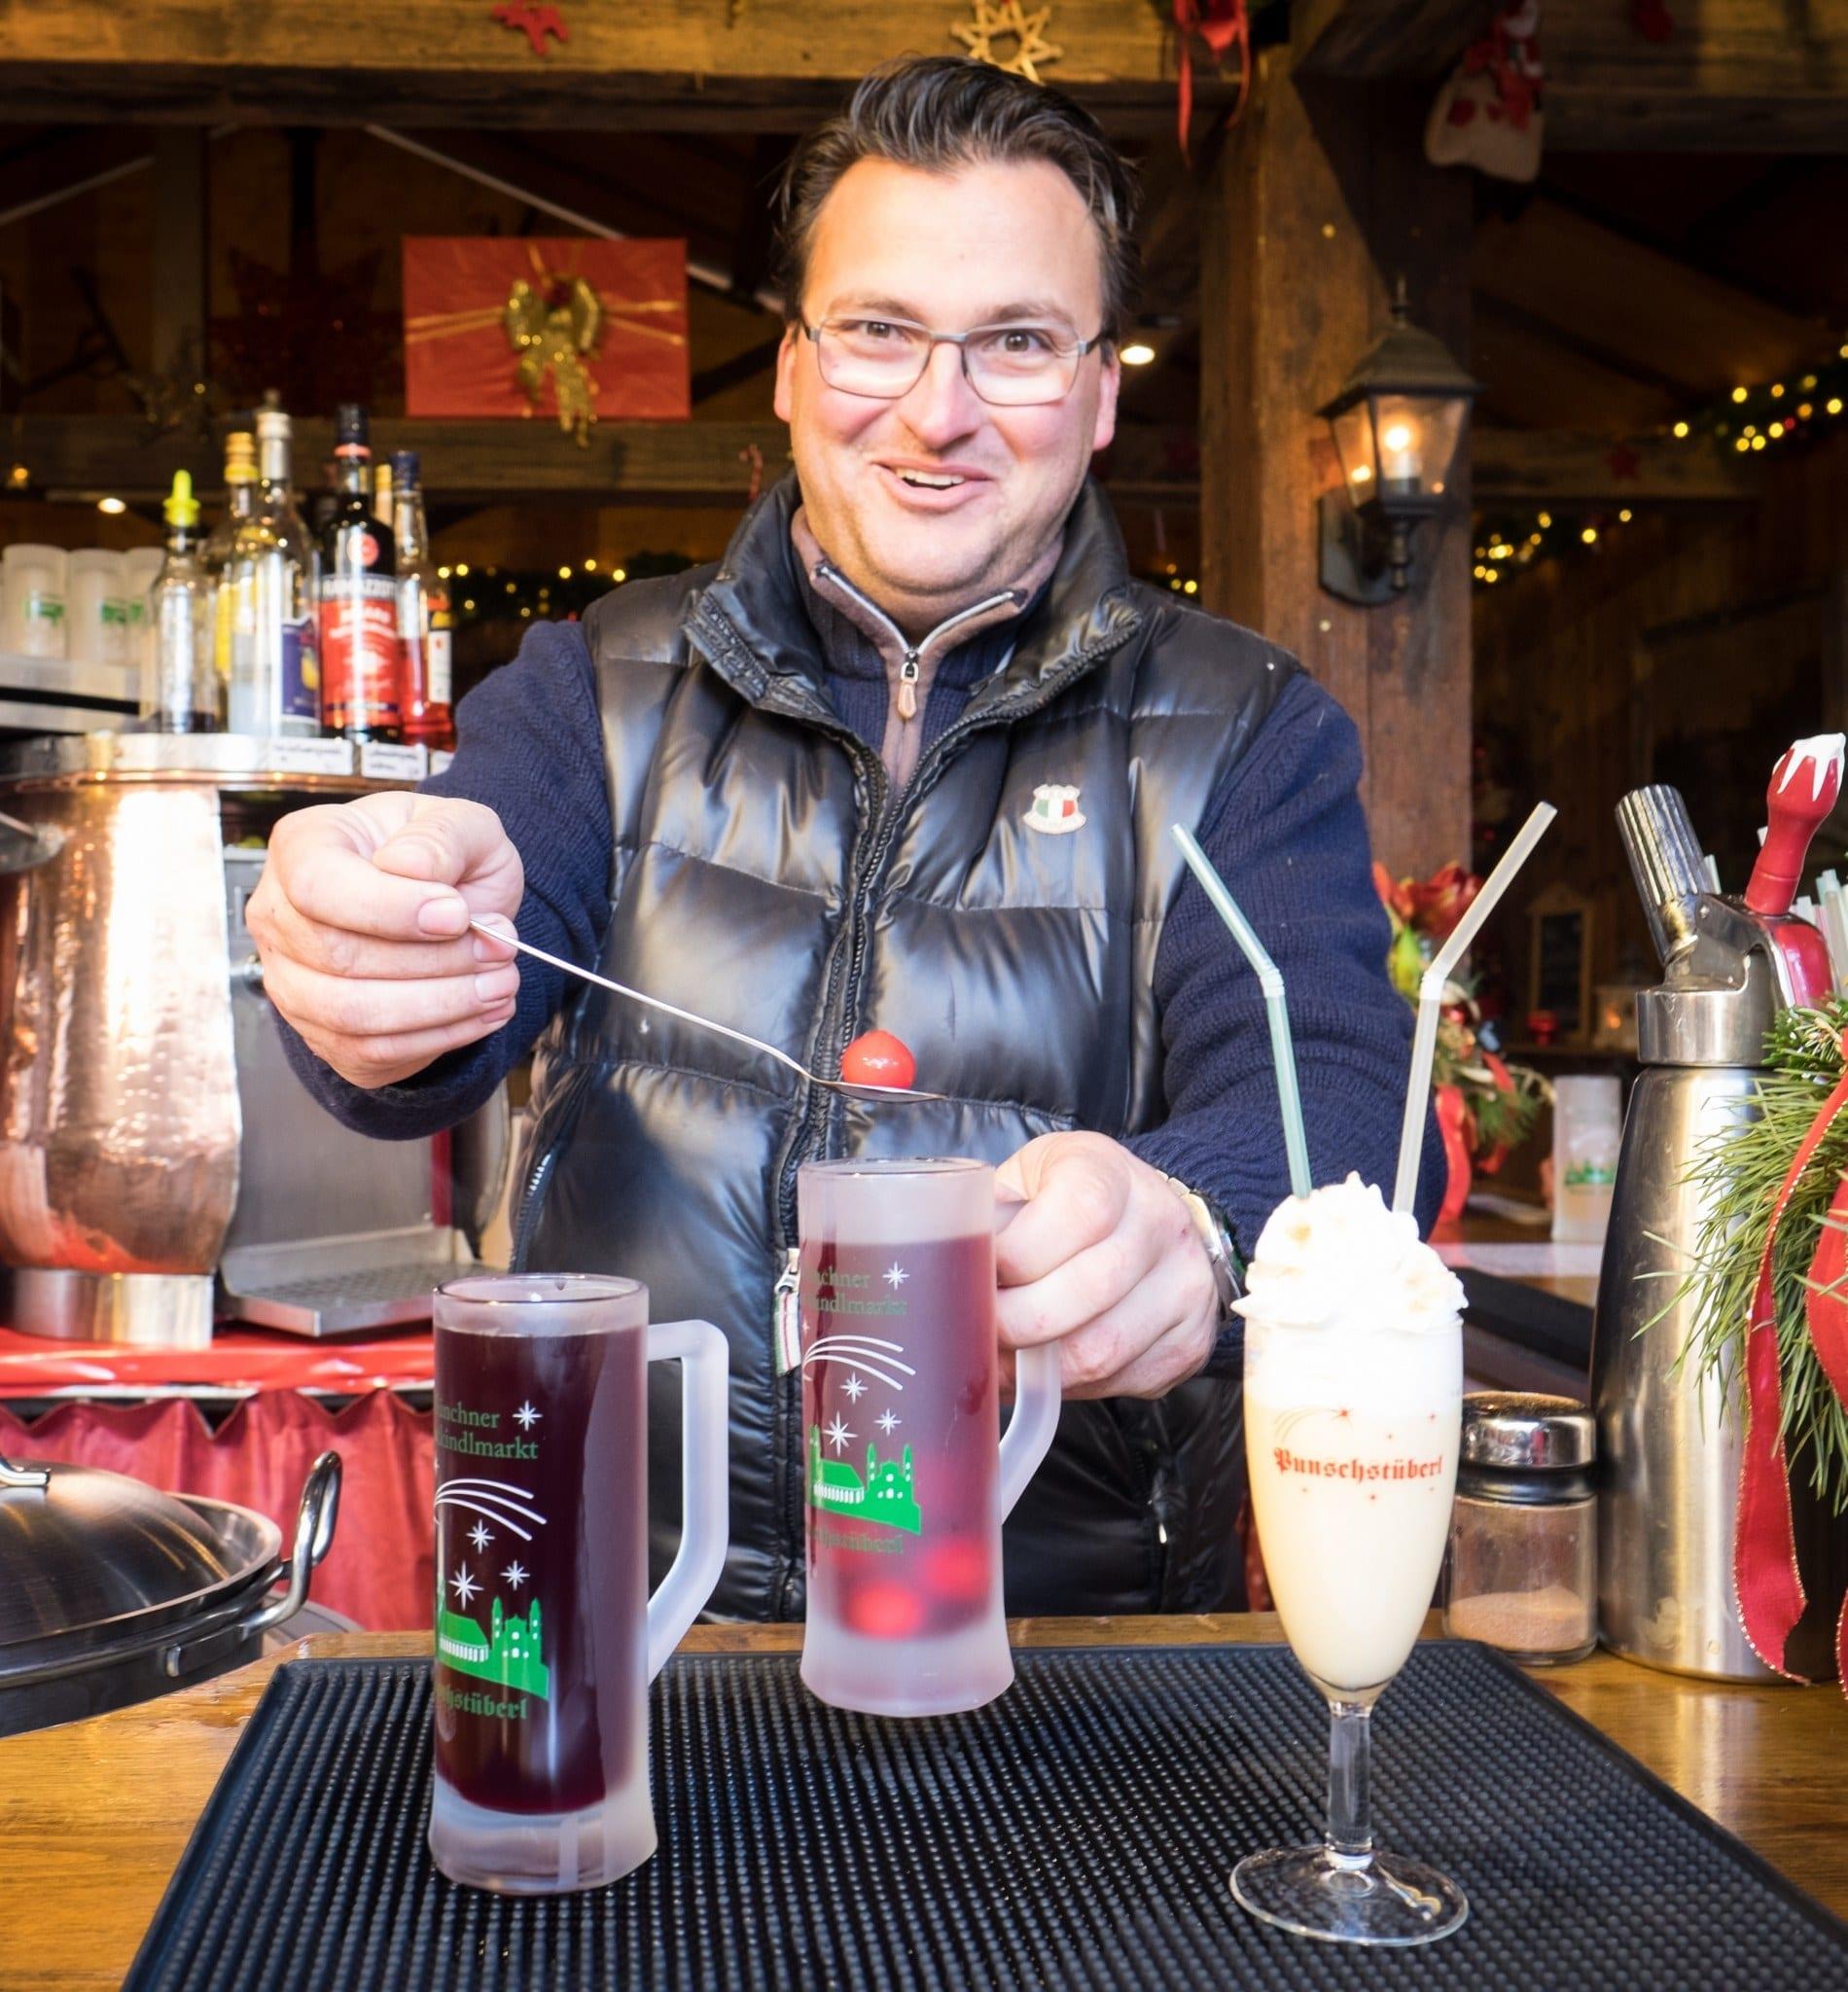 Gluhwein Man Christmas in Bavaria